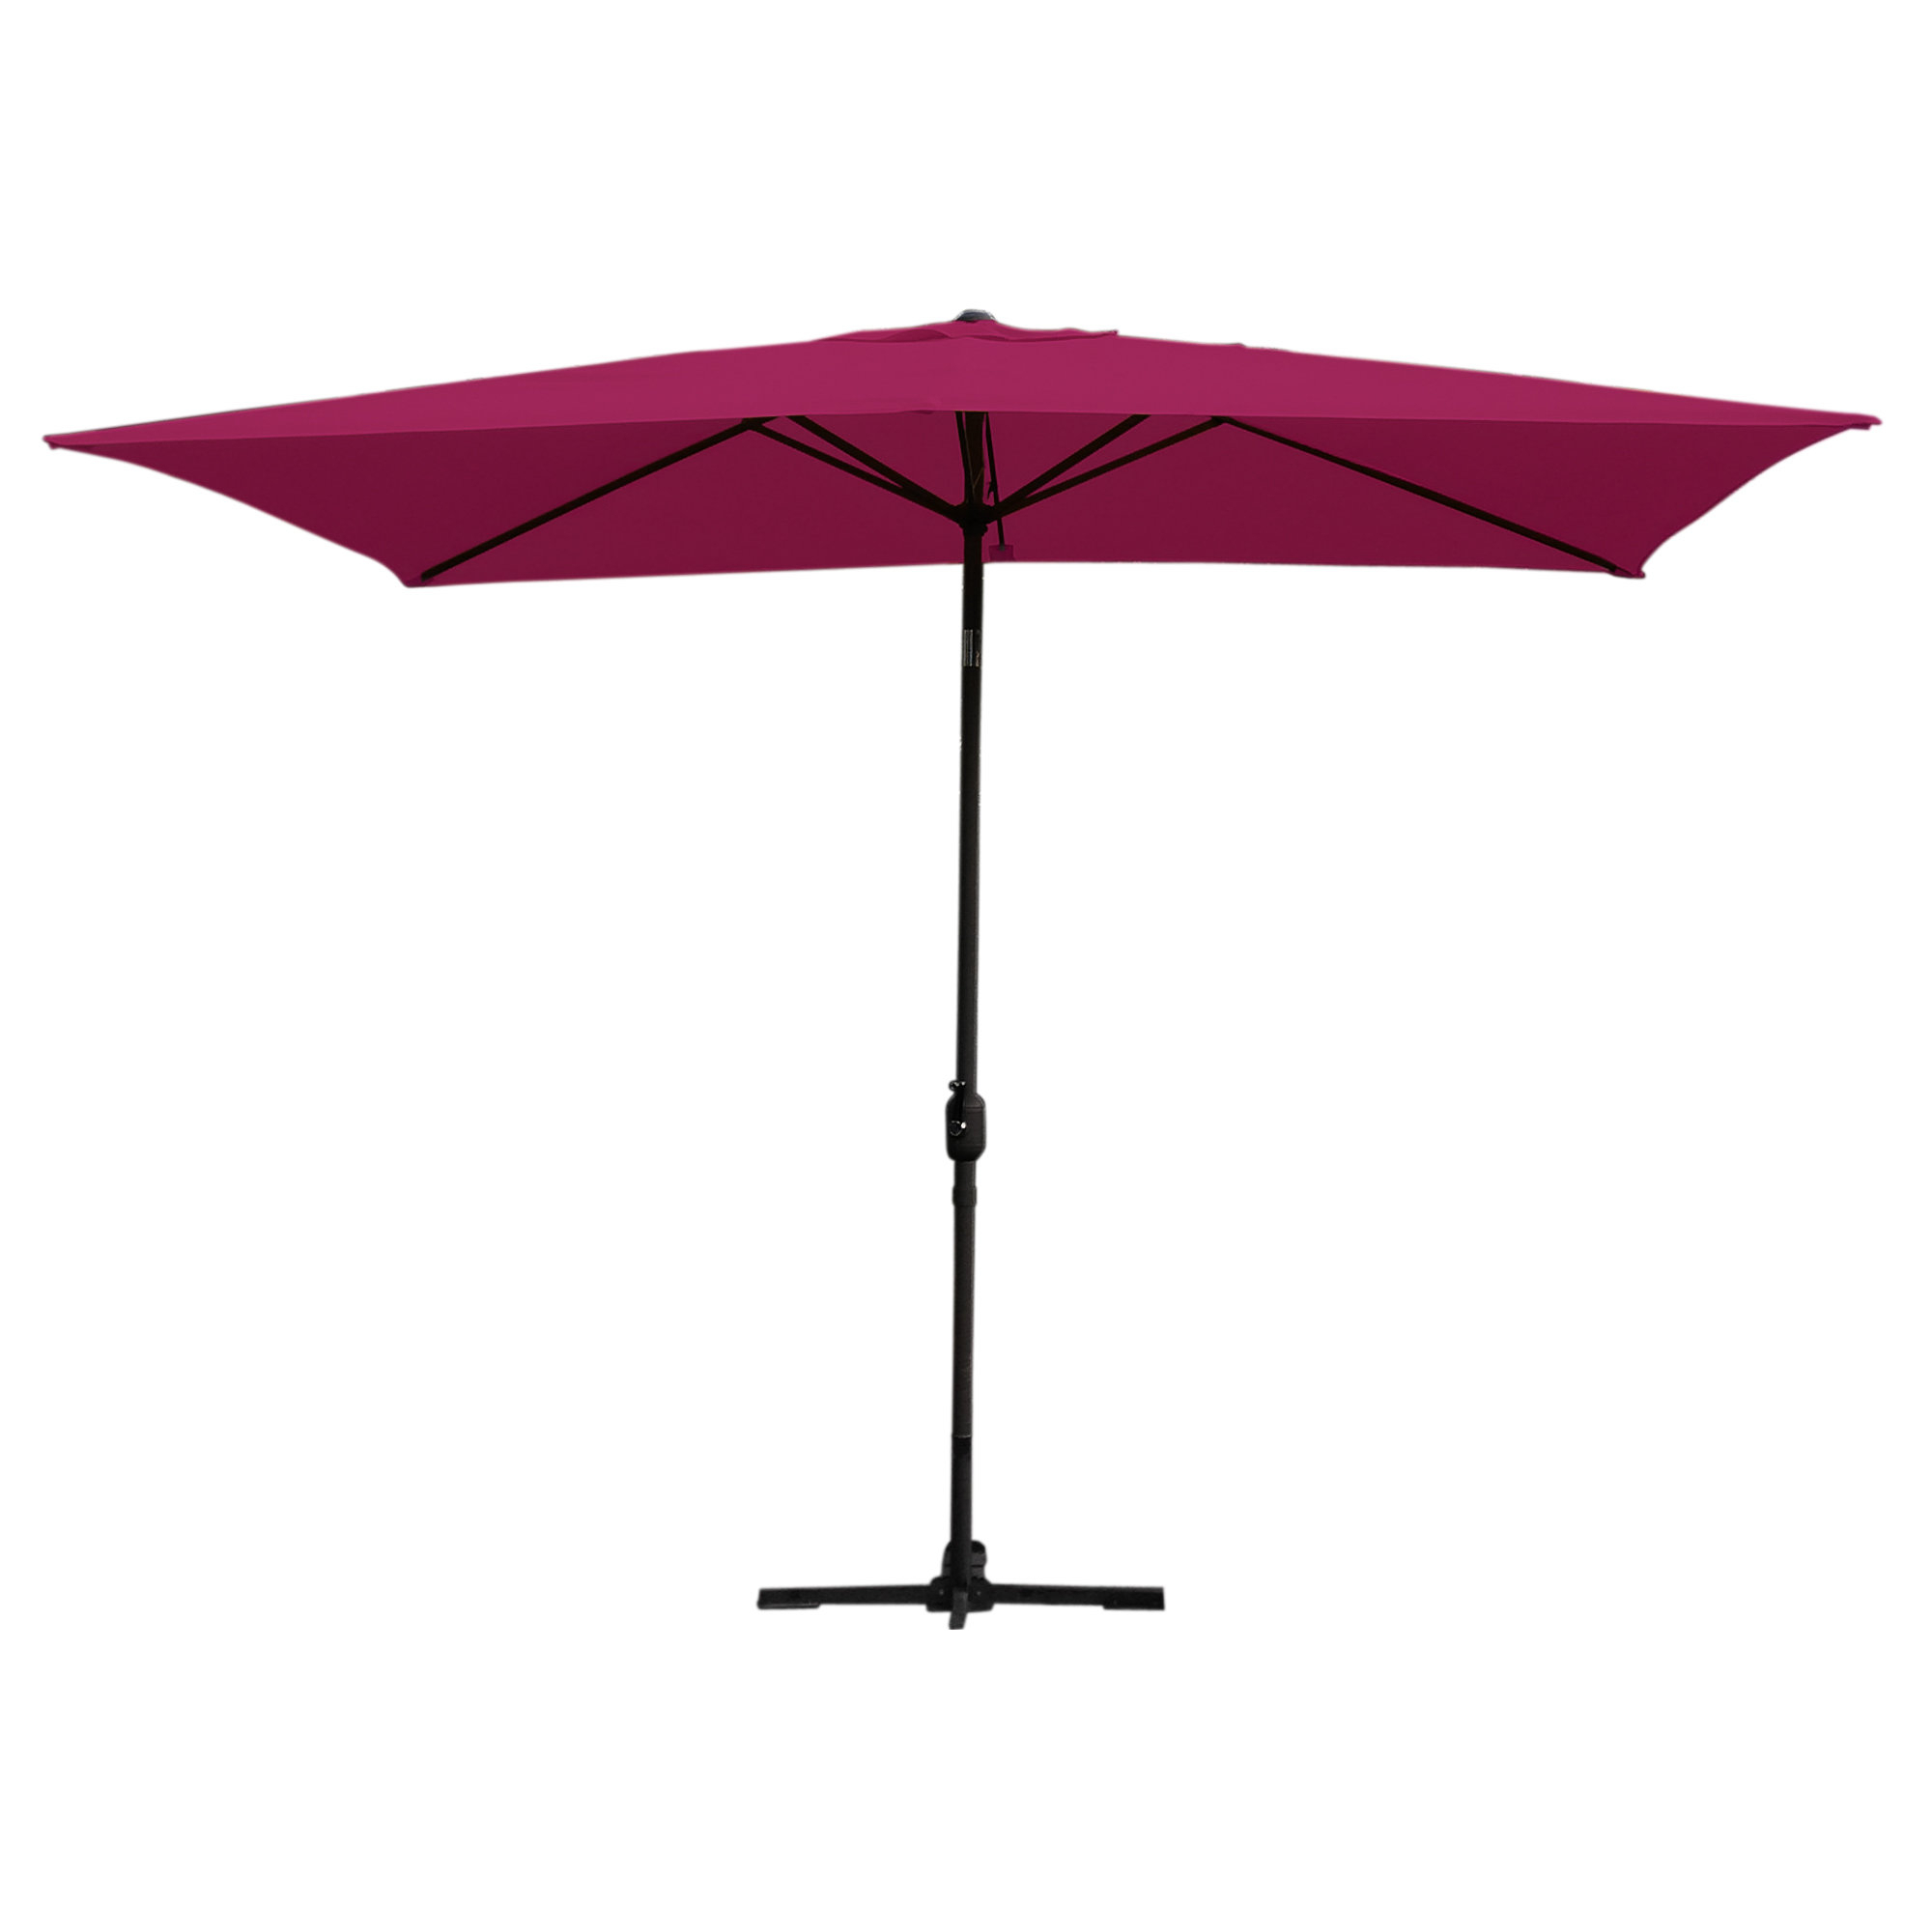 Wayfair Pertaining To Pau Rectangular Market Umbrellas (View 19 of 20)